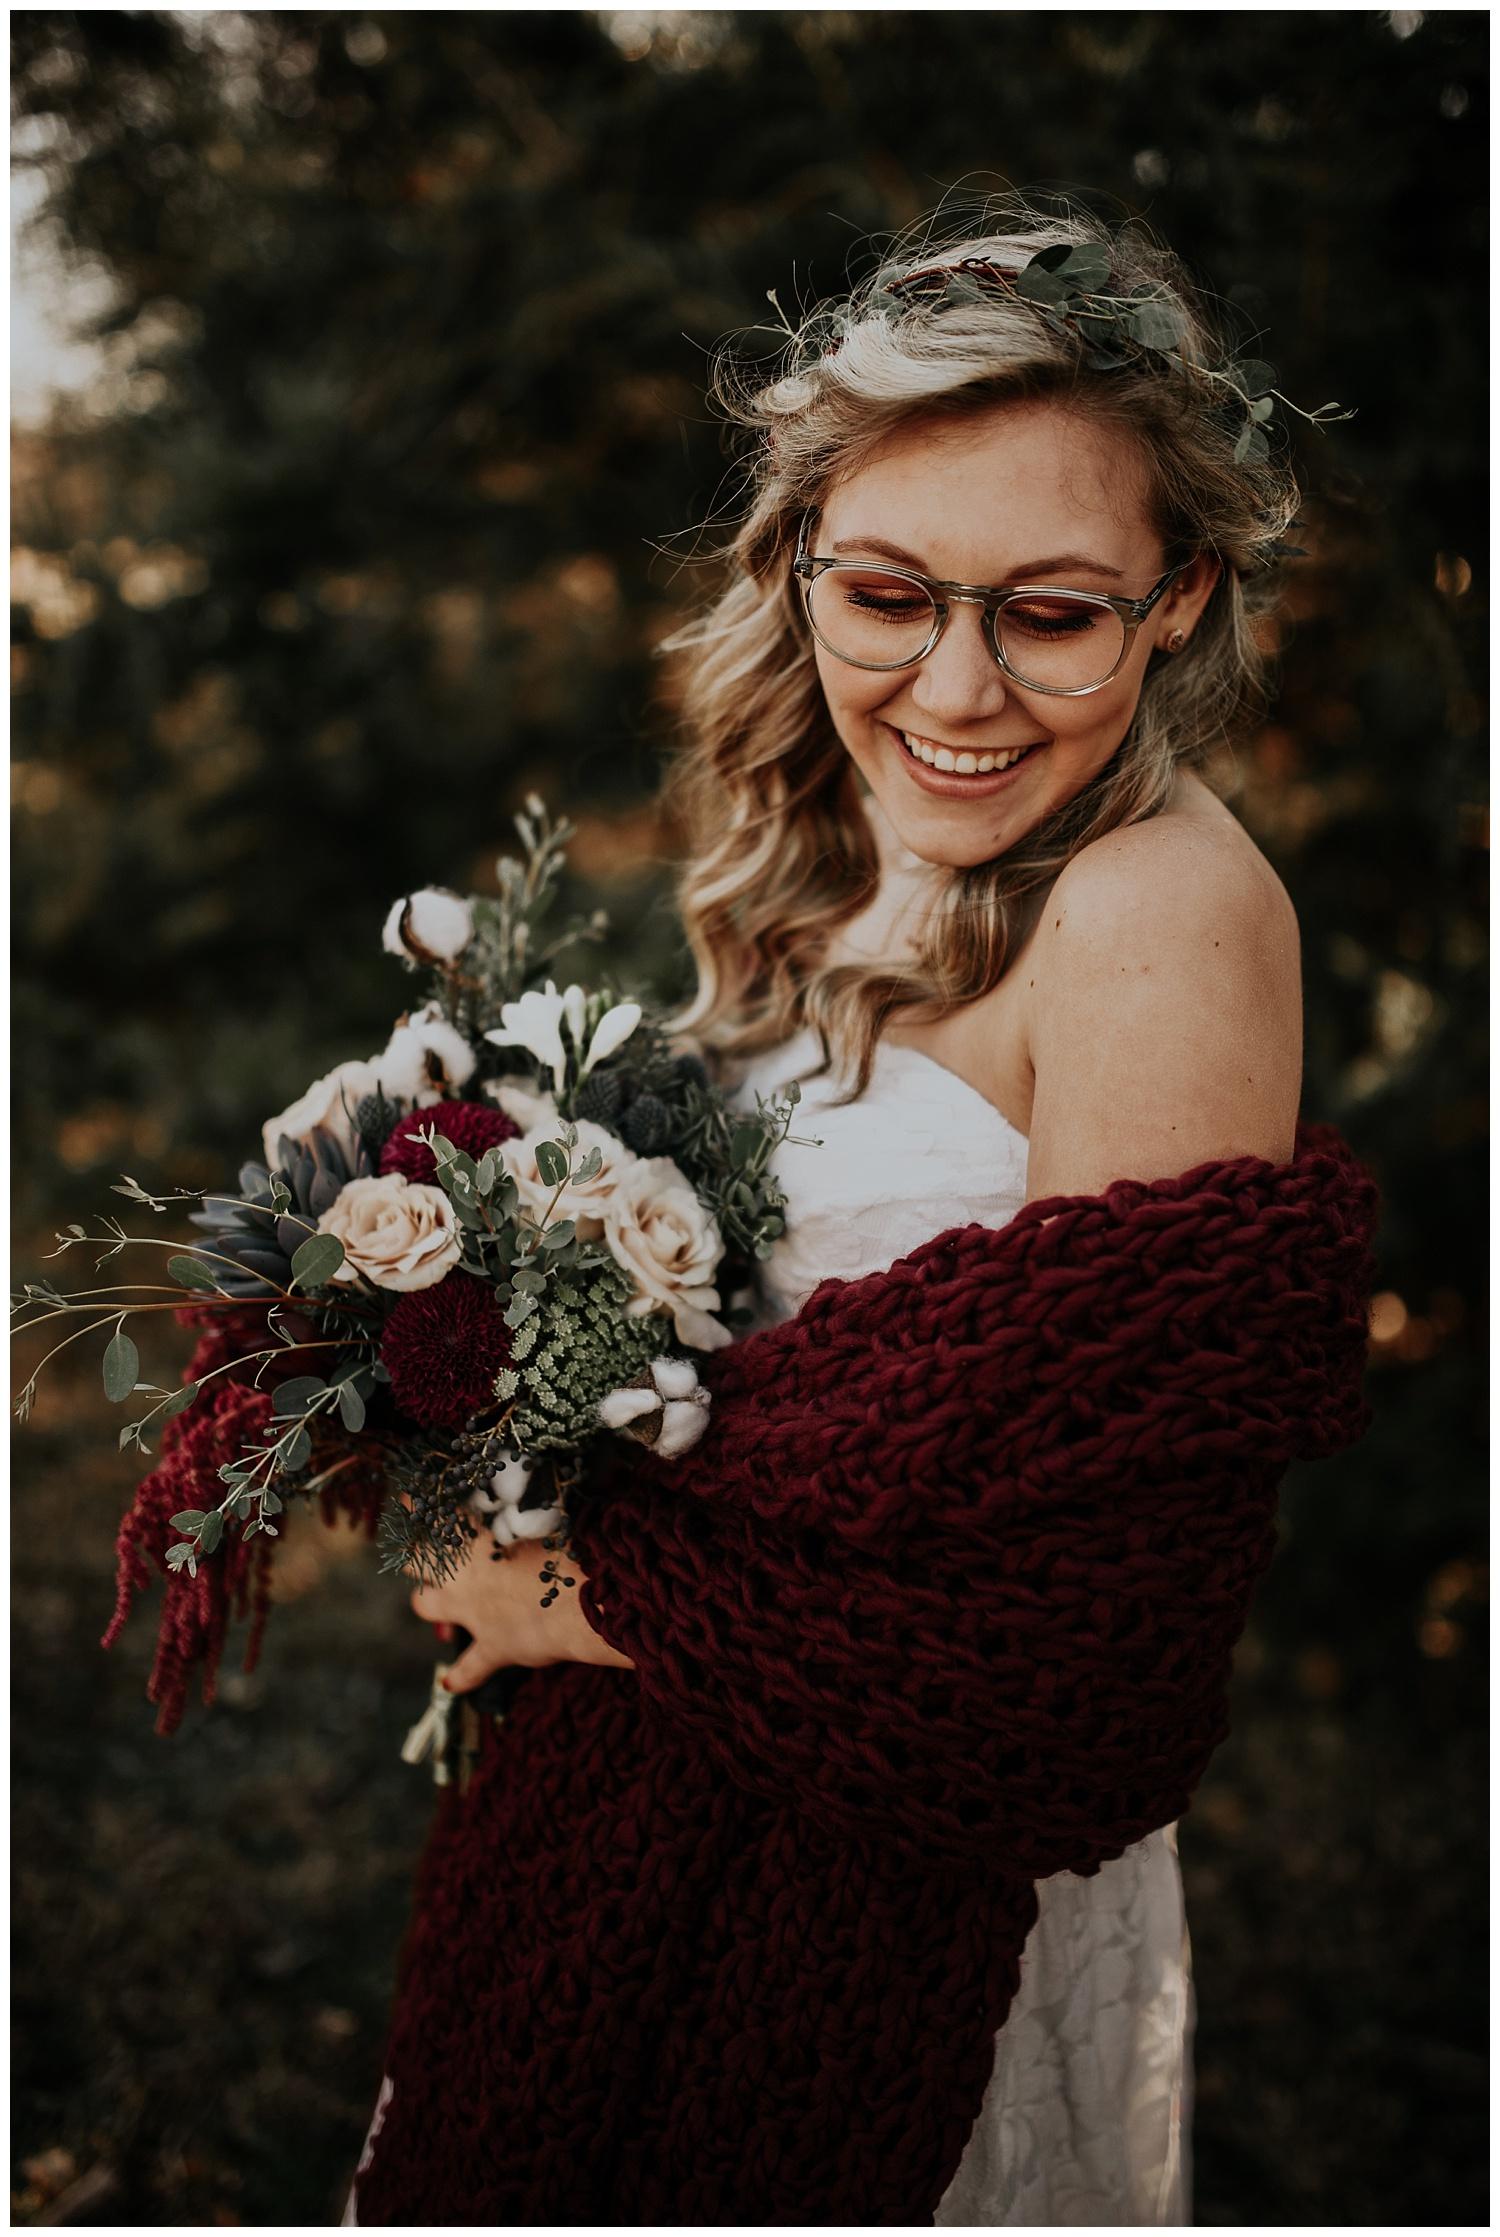 Laken-Mackenzie-Photography-Brownlee-Bridal-Session-Dallas-Fort-Worth-Wedding-Photographer04.jpg